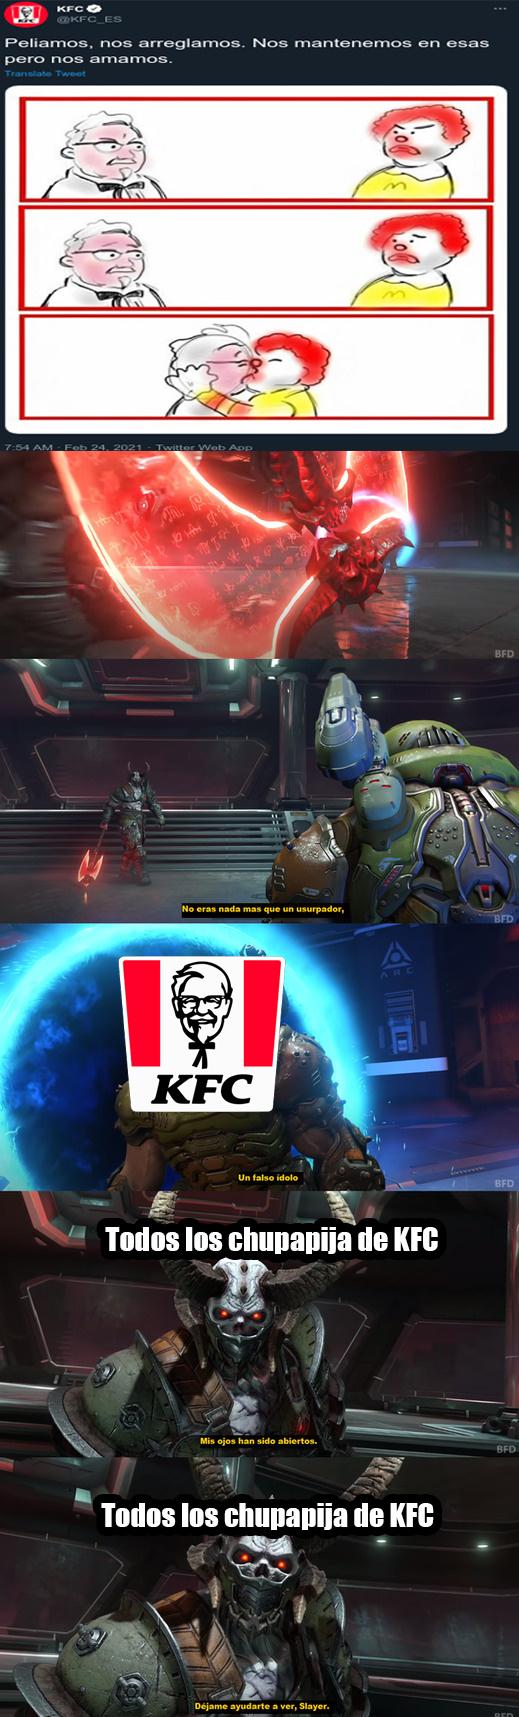 KFC nunca le supo al chispop - meme